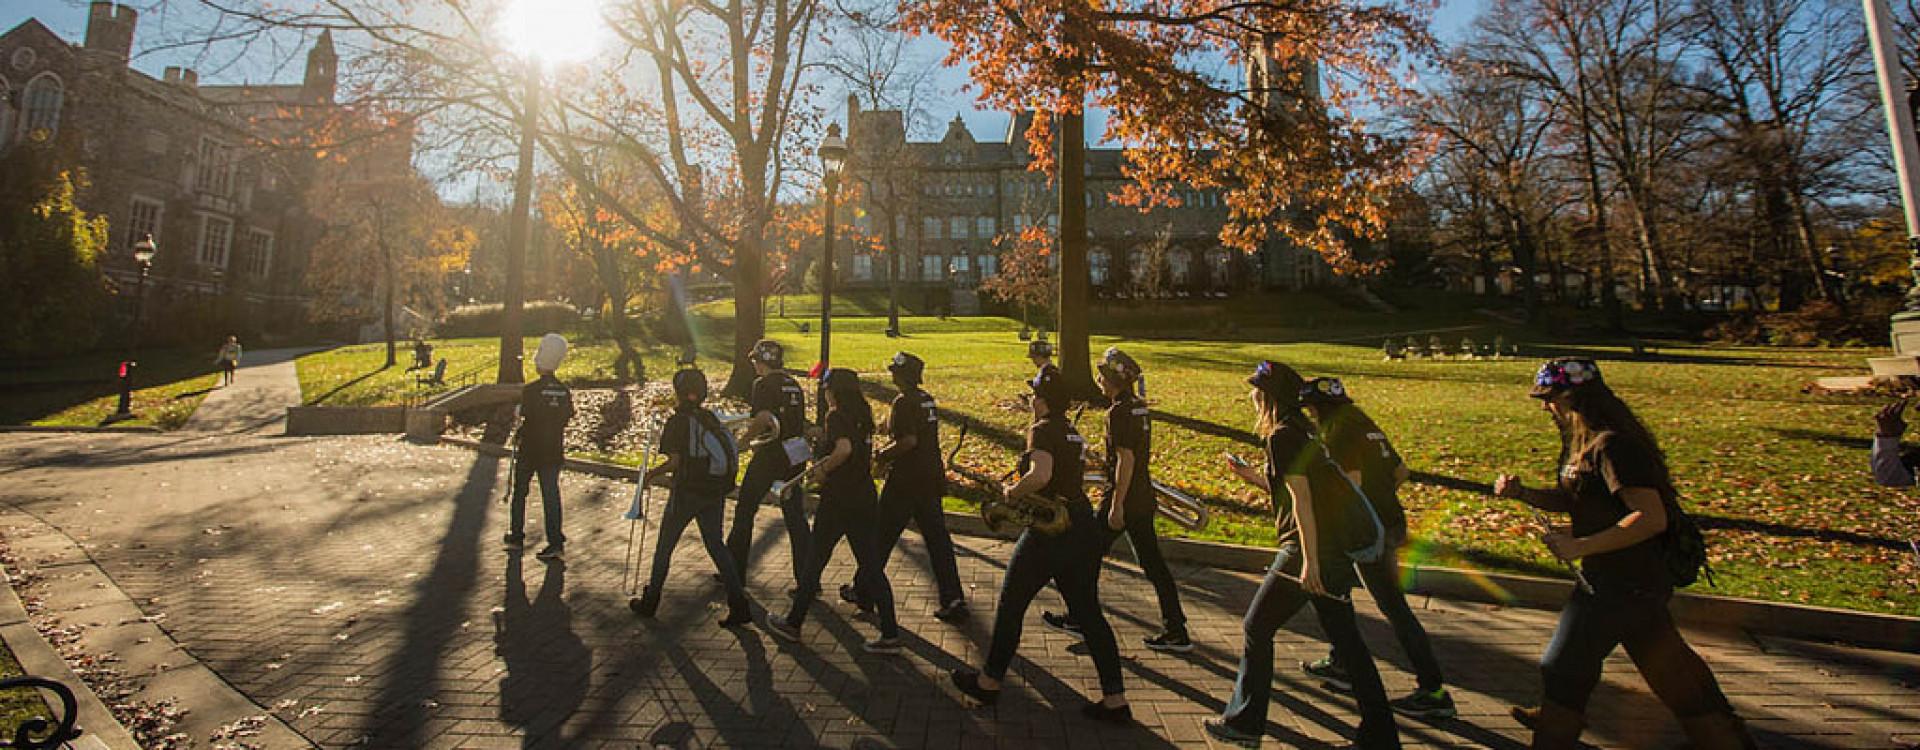 UC Memorial Walkway - LU Marching Band